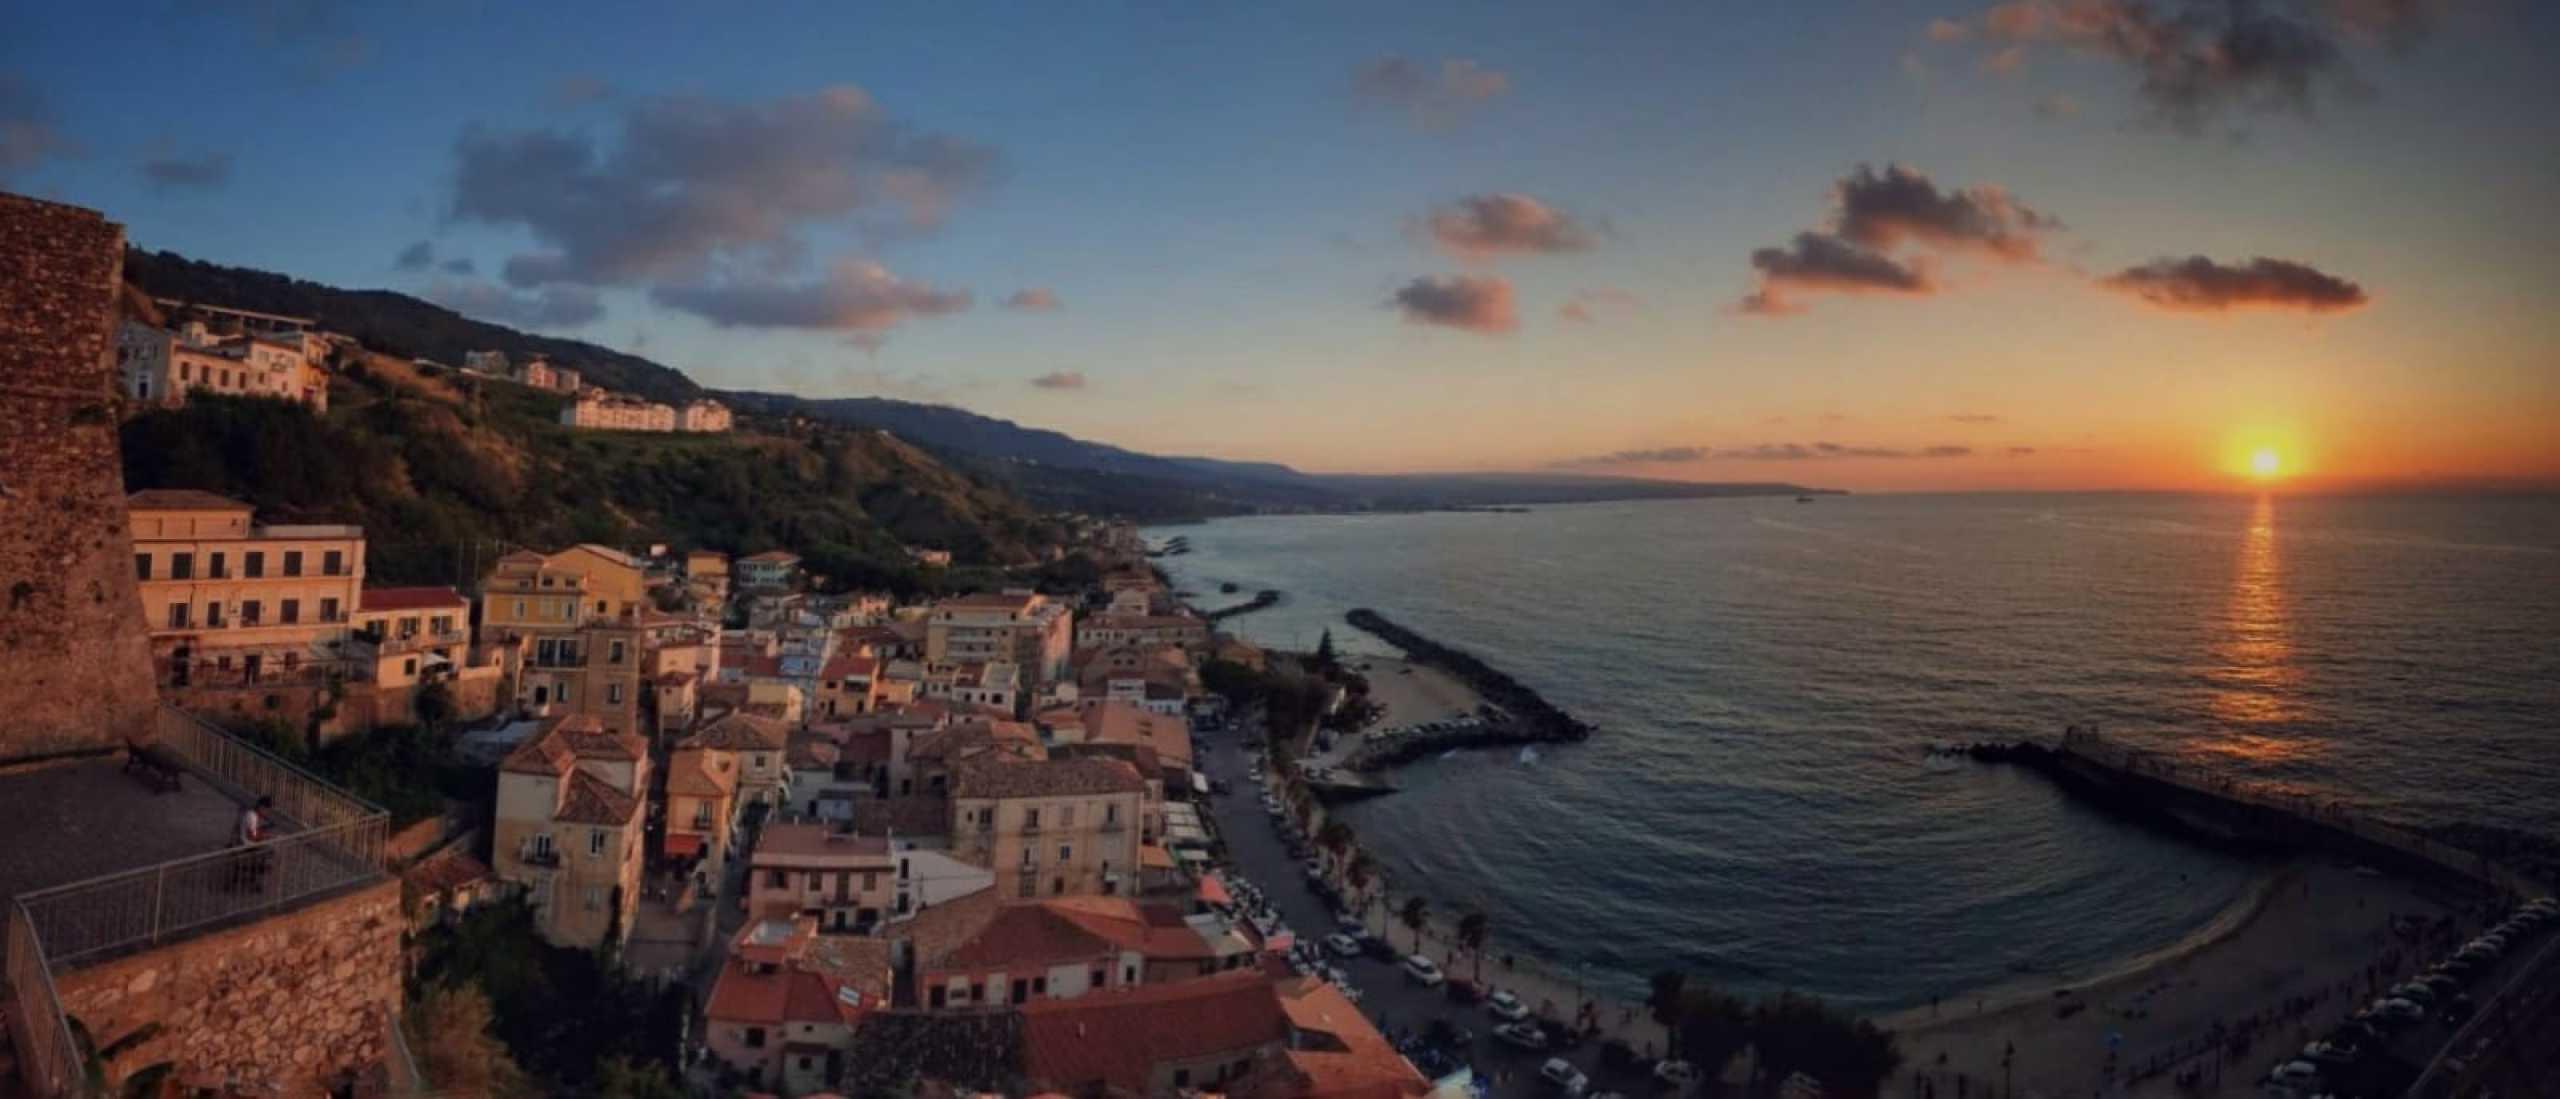 Italie, vier keer totaal anders genieten